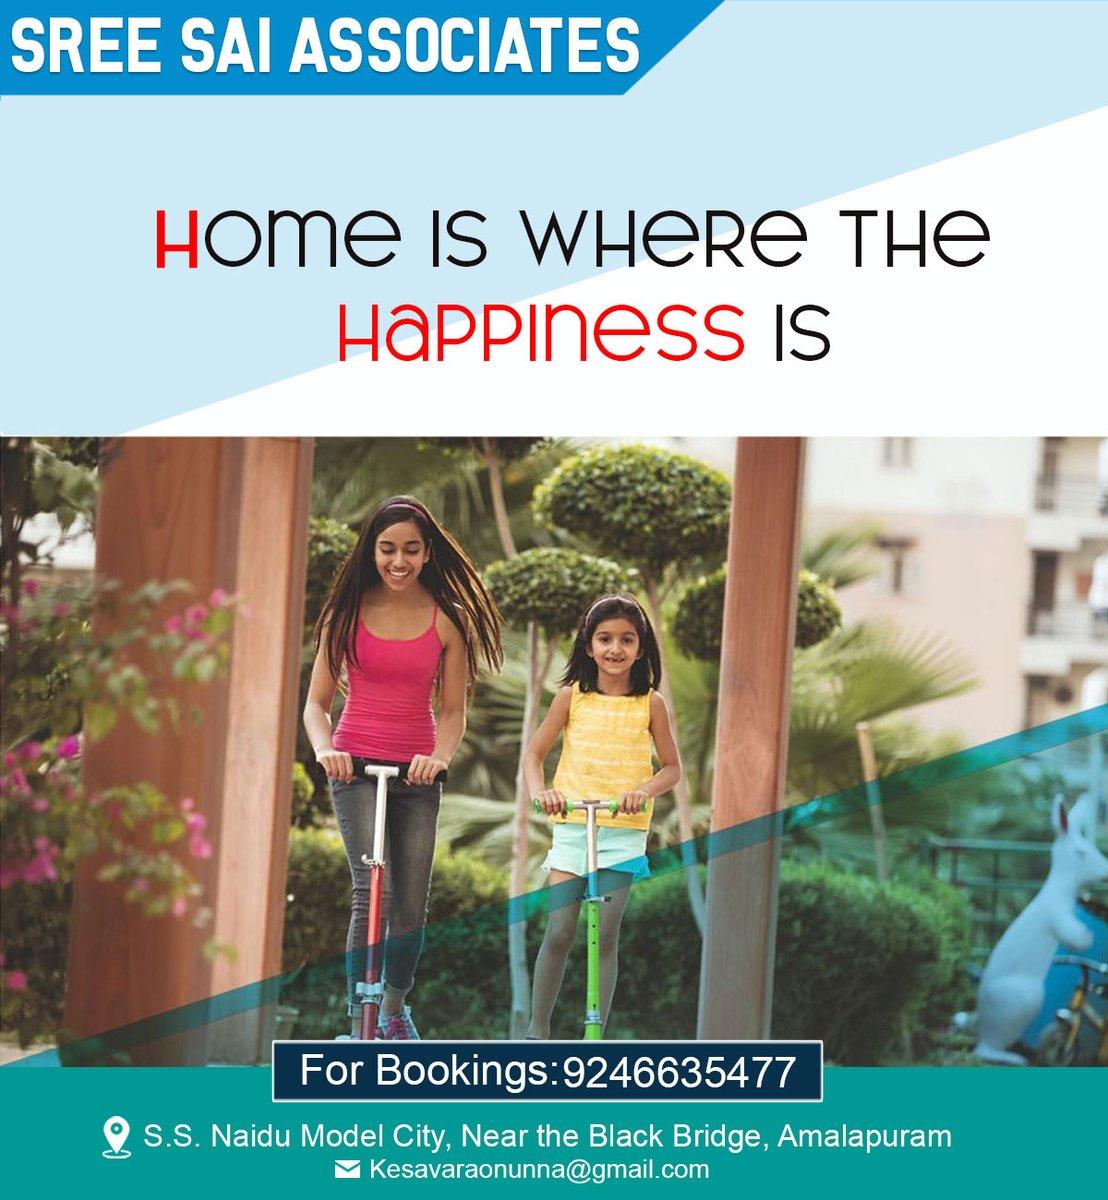 Home is where the Happiness Is #vastu #comfort #sreesaiassociates #amalapuram #eastgodavari #twintowers #apartments #associates #superspecifications #interiordesigning #structure #doors #windows #flooring #kitchen #wardrobes #toilets #electricals #plumbing #paints